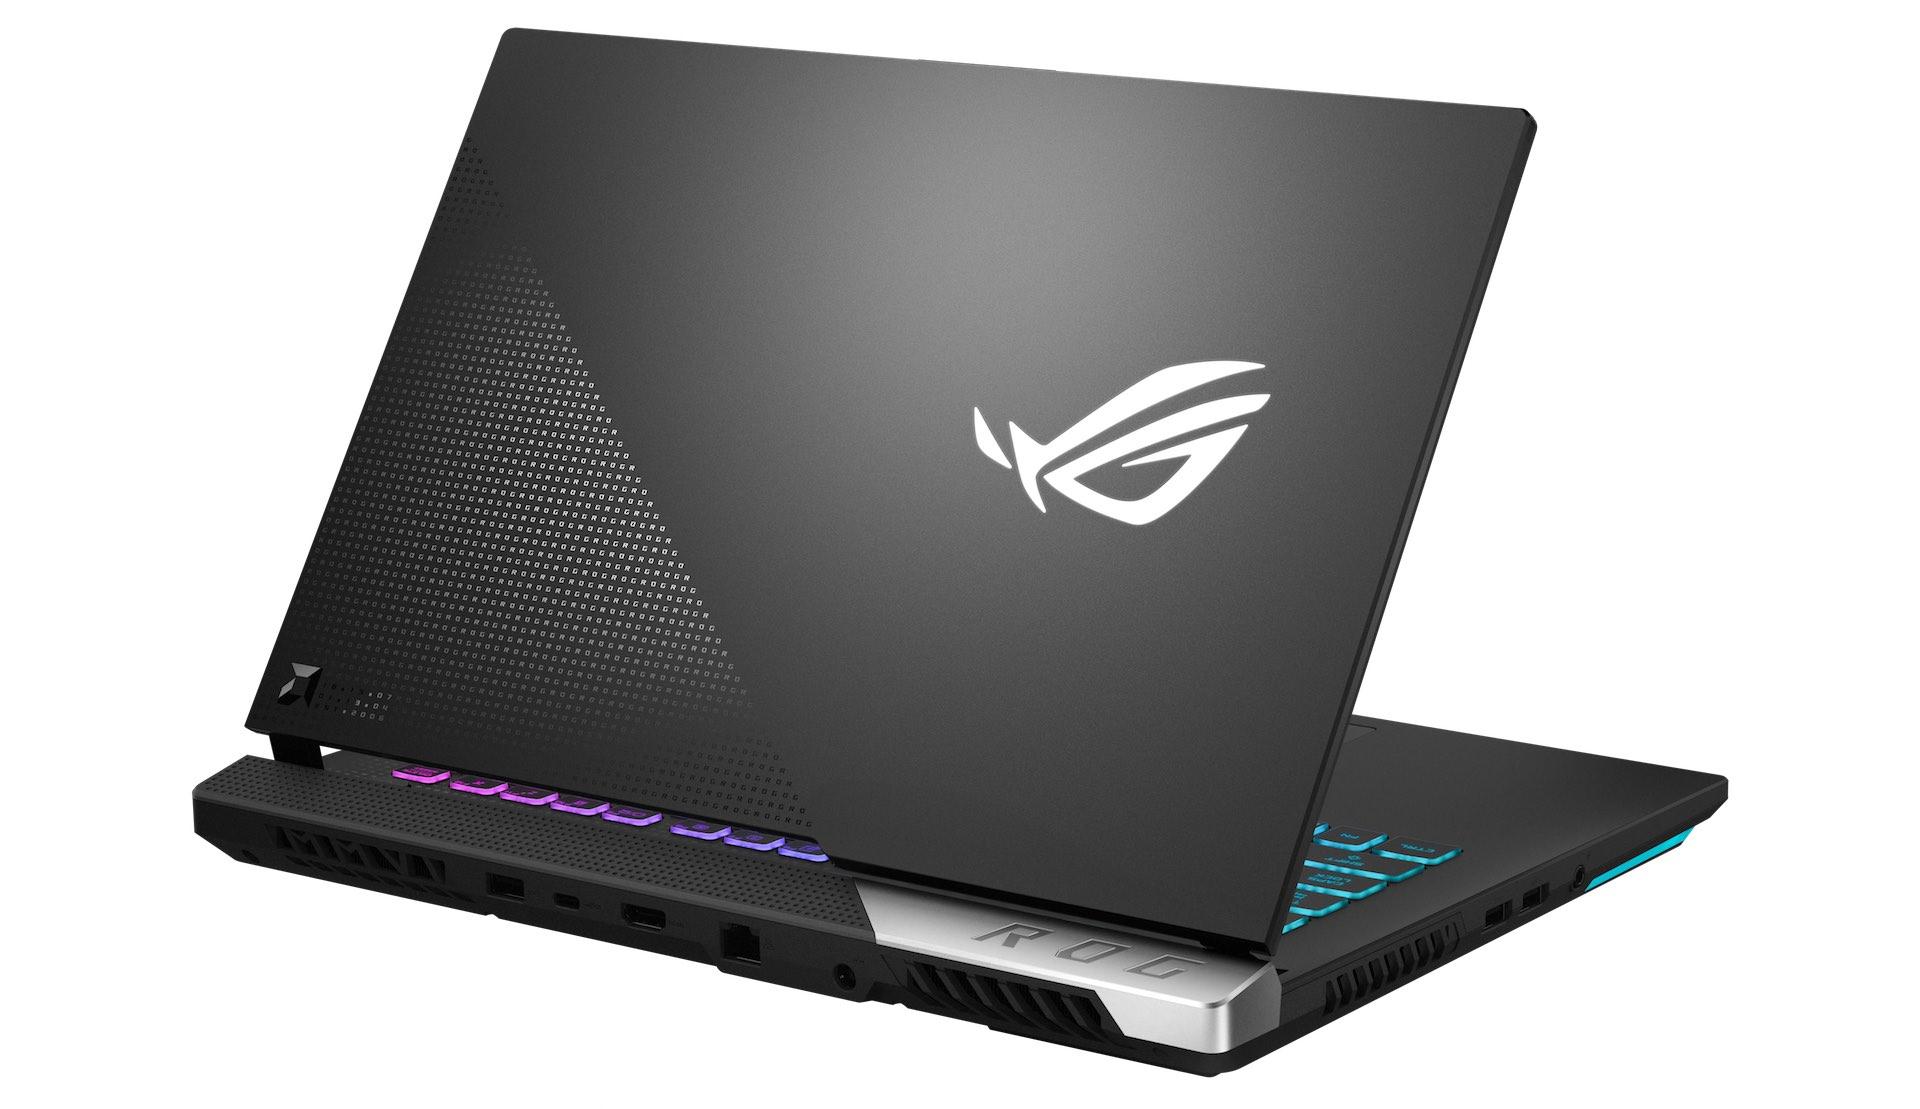 ASUS ROG Strix G15 AMD Advantage